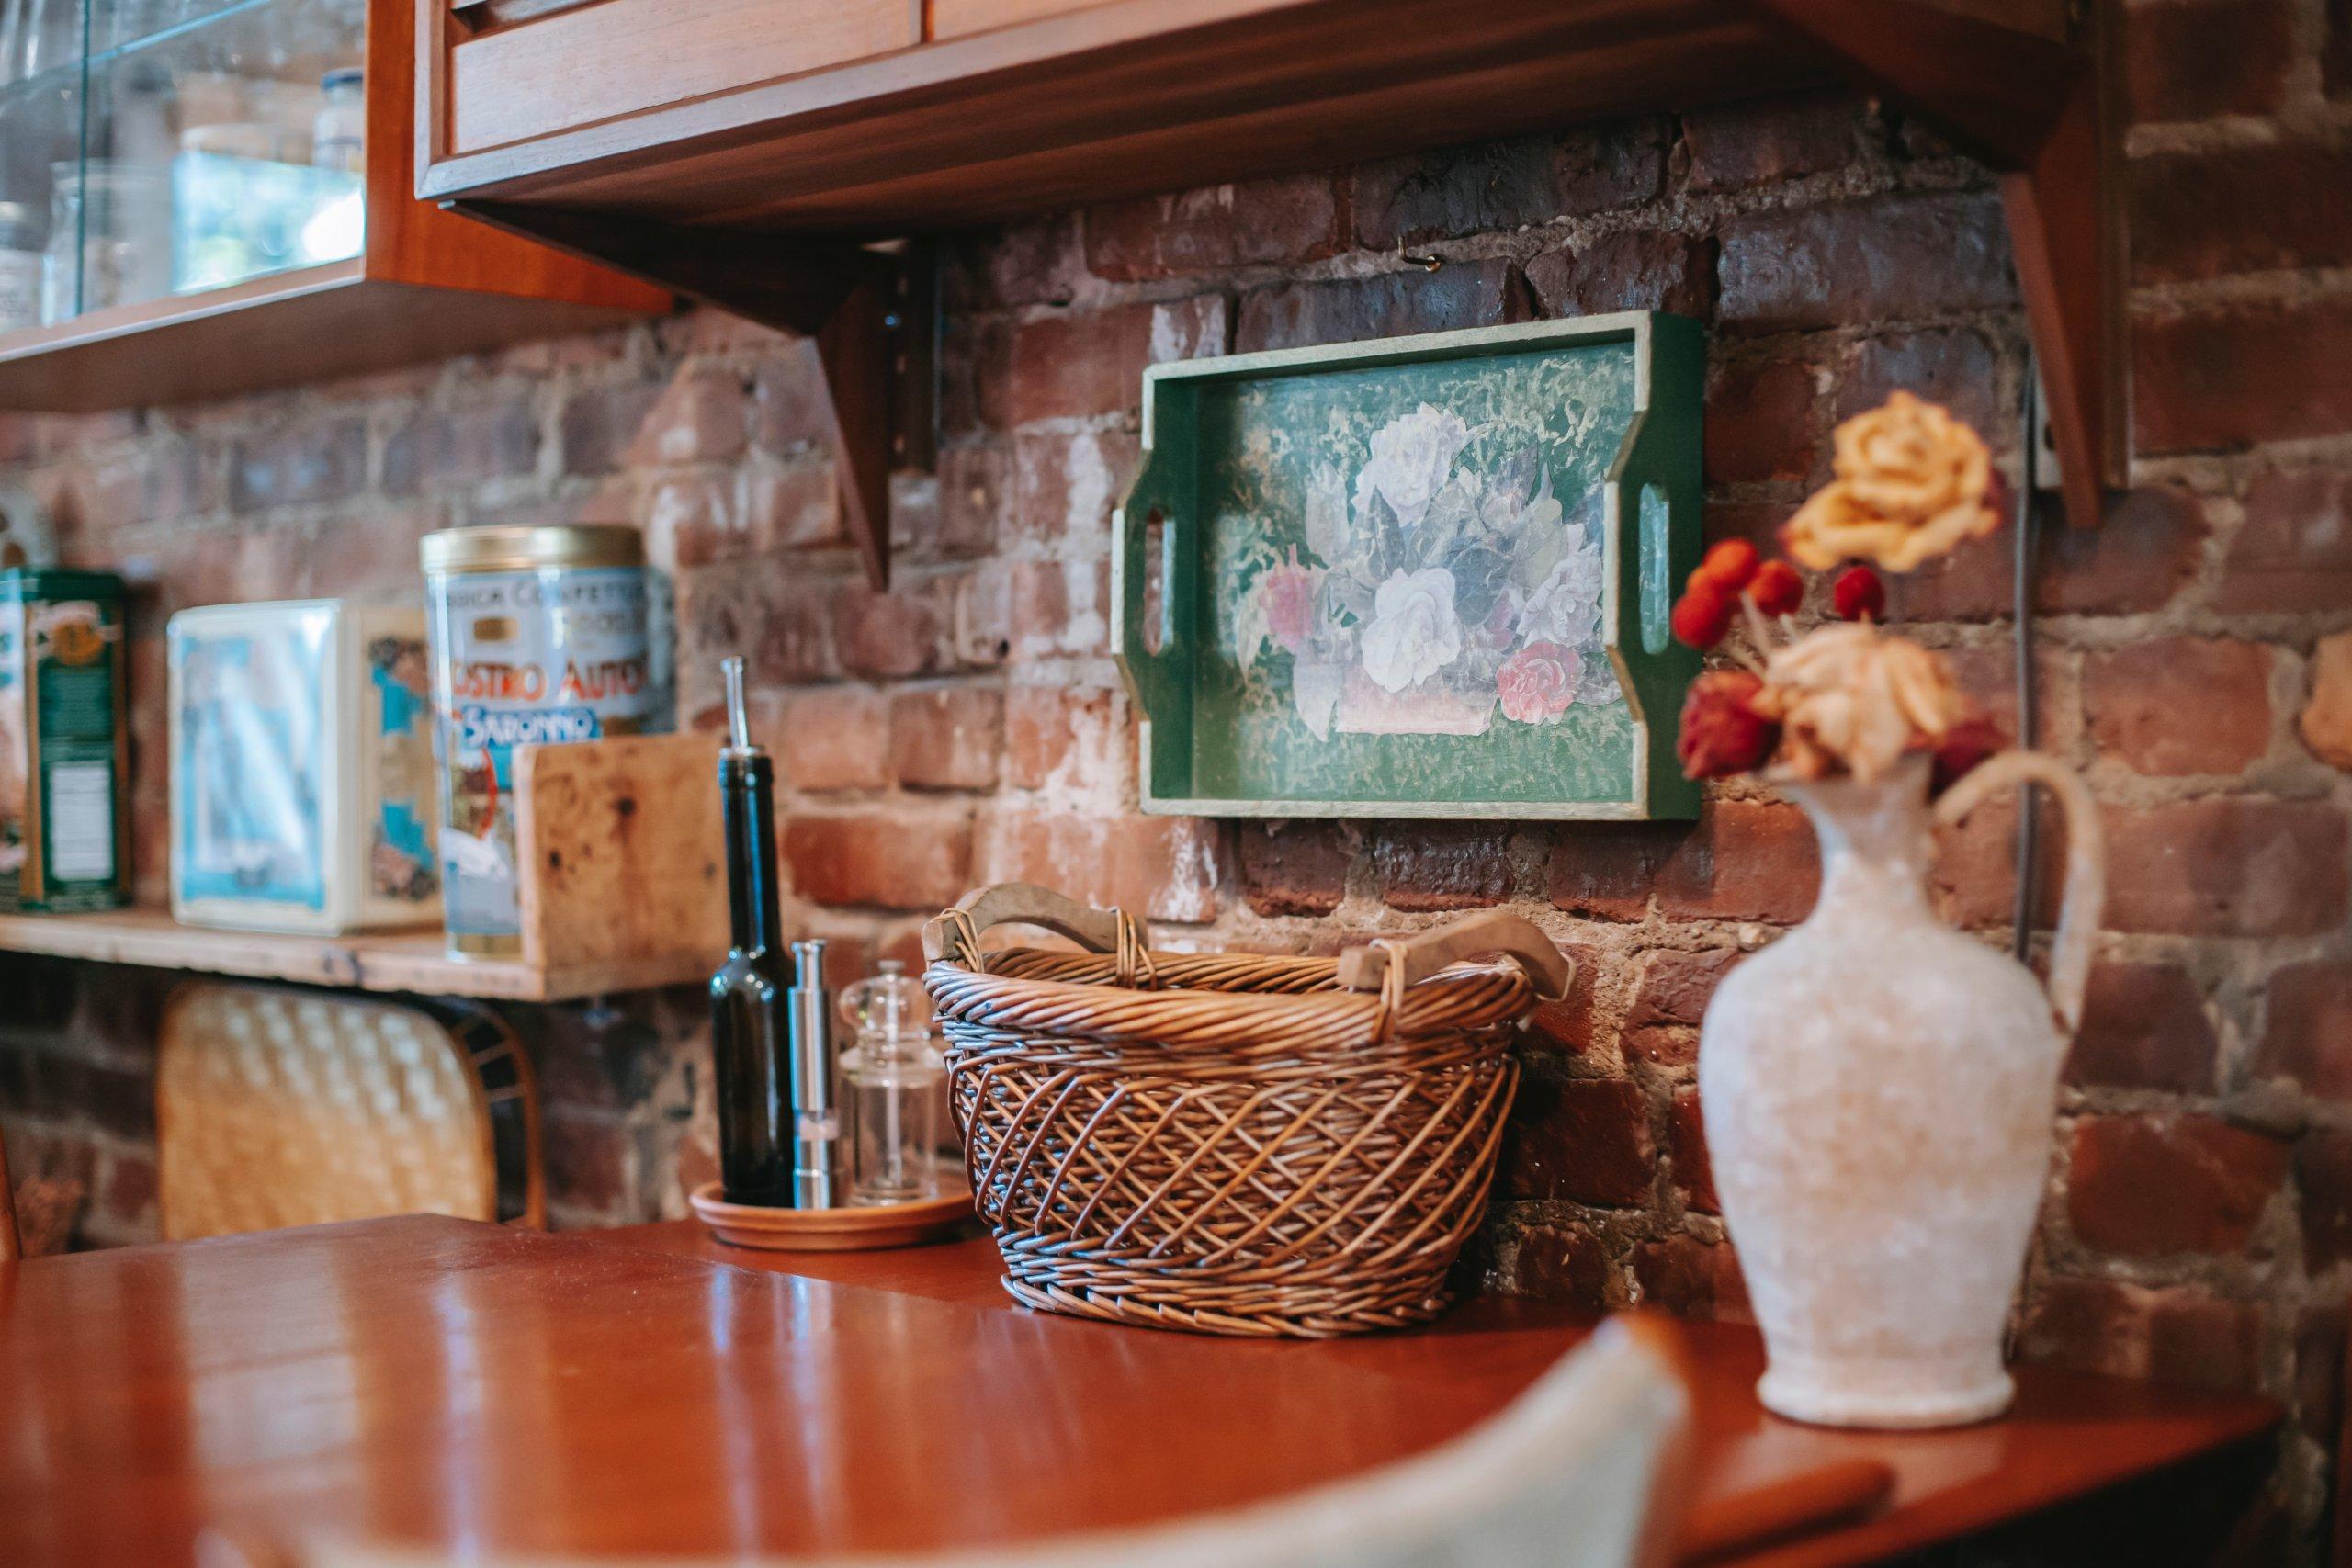 Brick wall kitchen backsplash